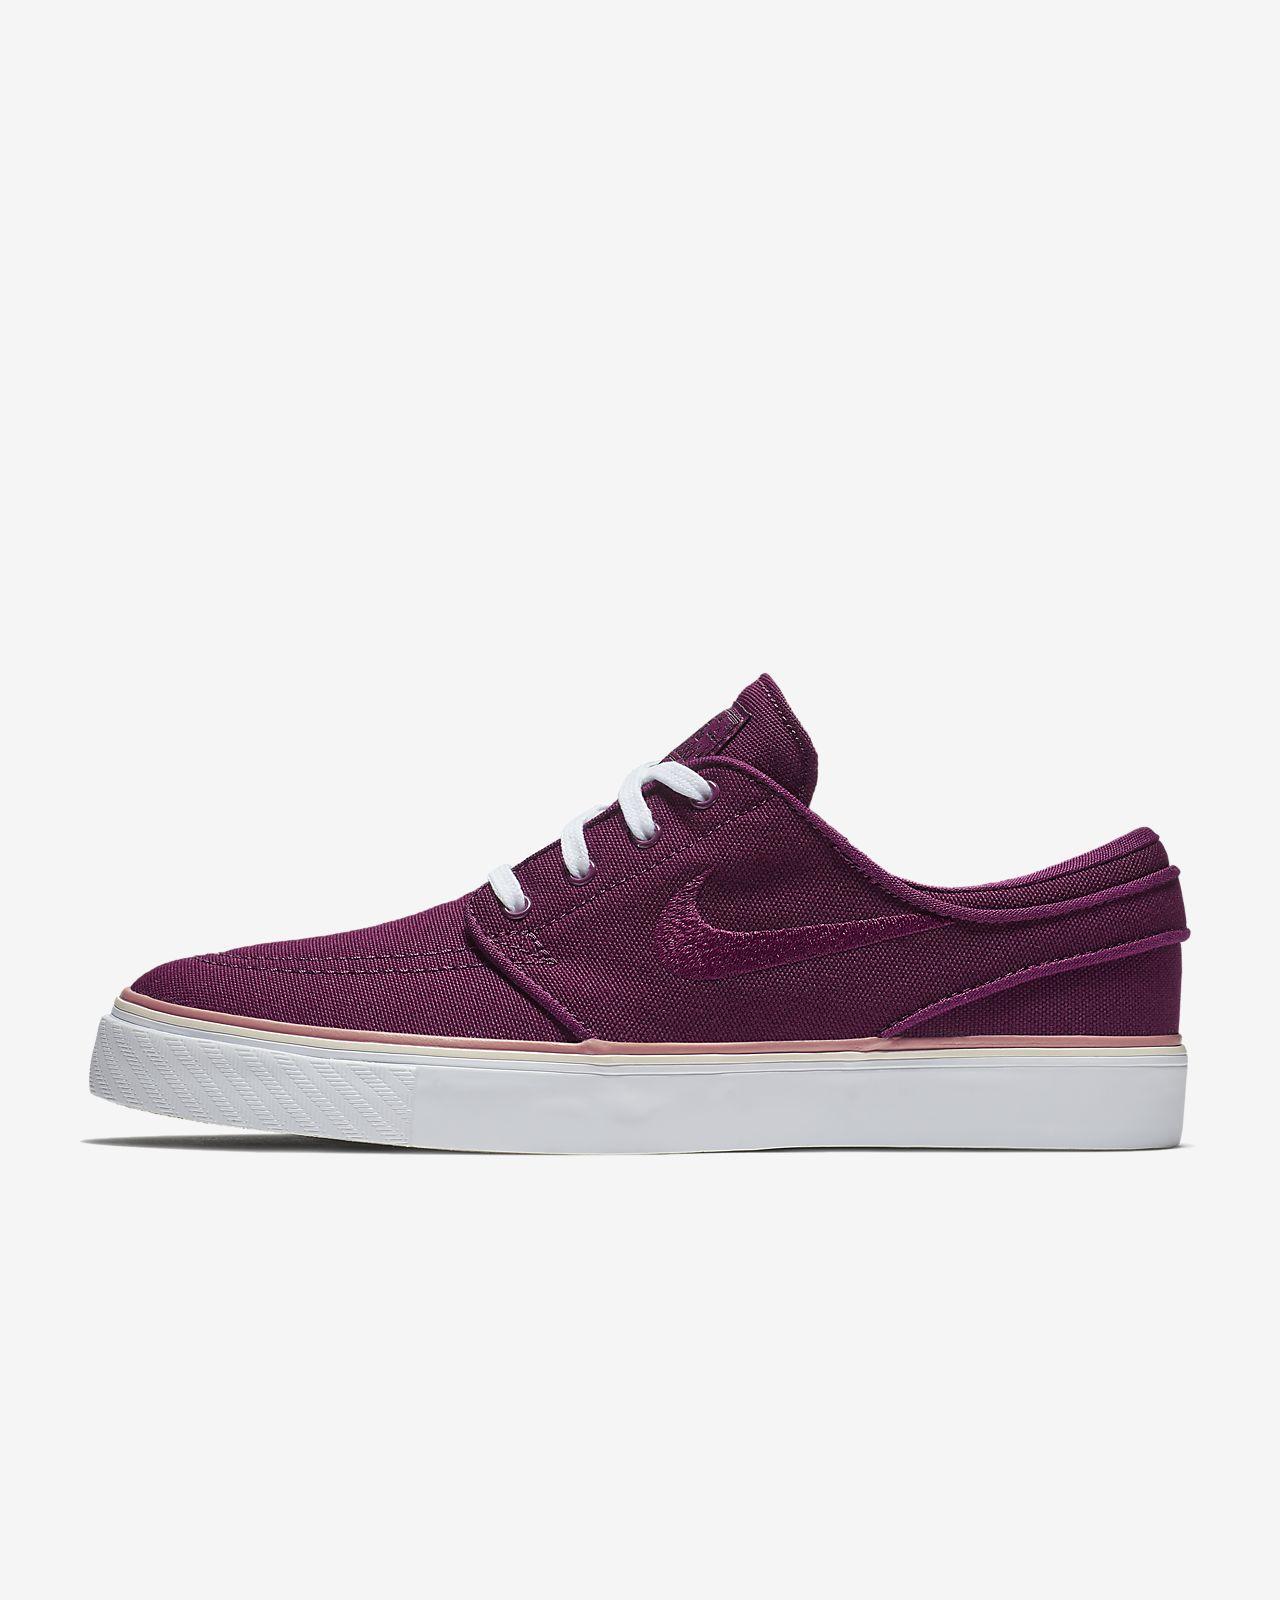 Nike SB Zoom Janoski Canvas Damen-Skateboardschuh    | Online-Shop